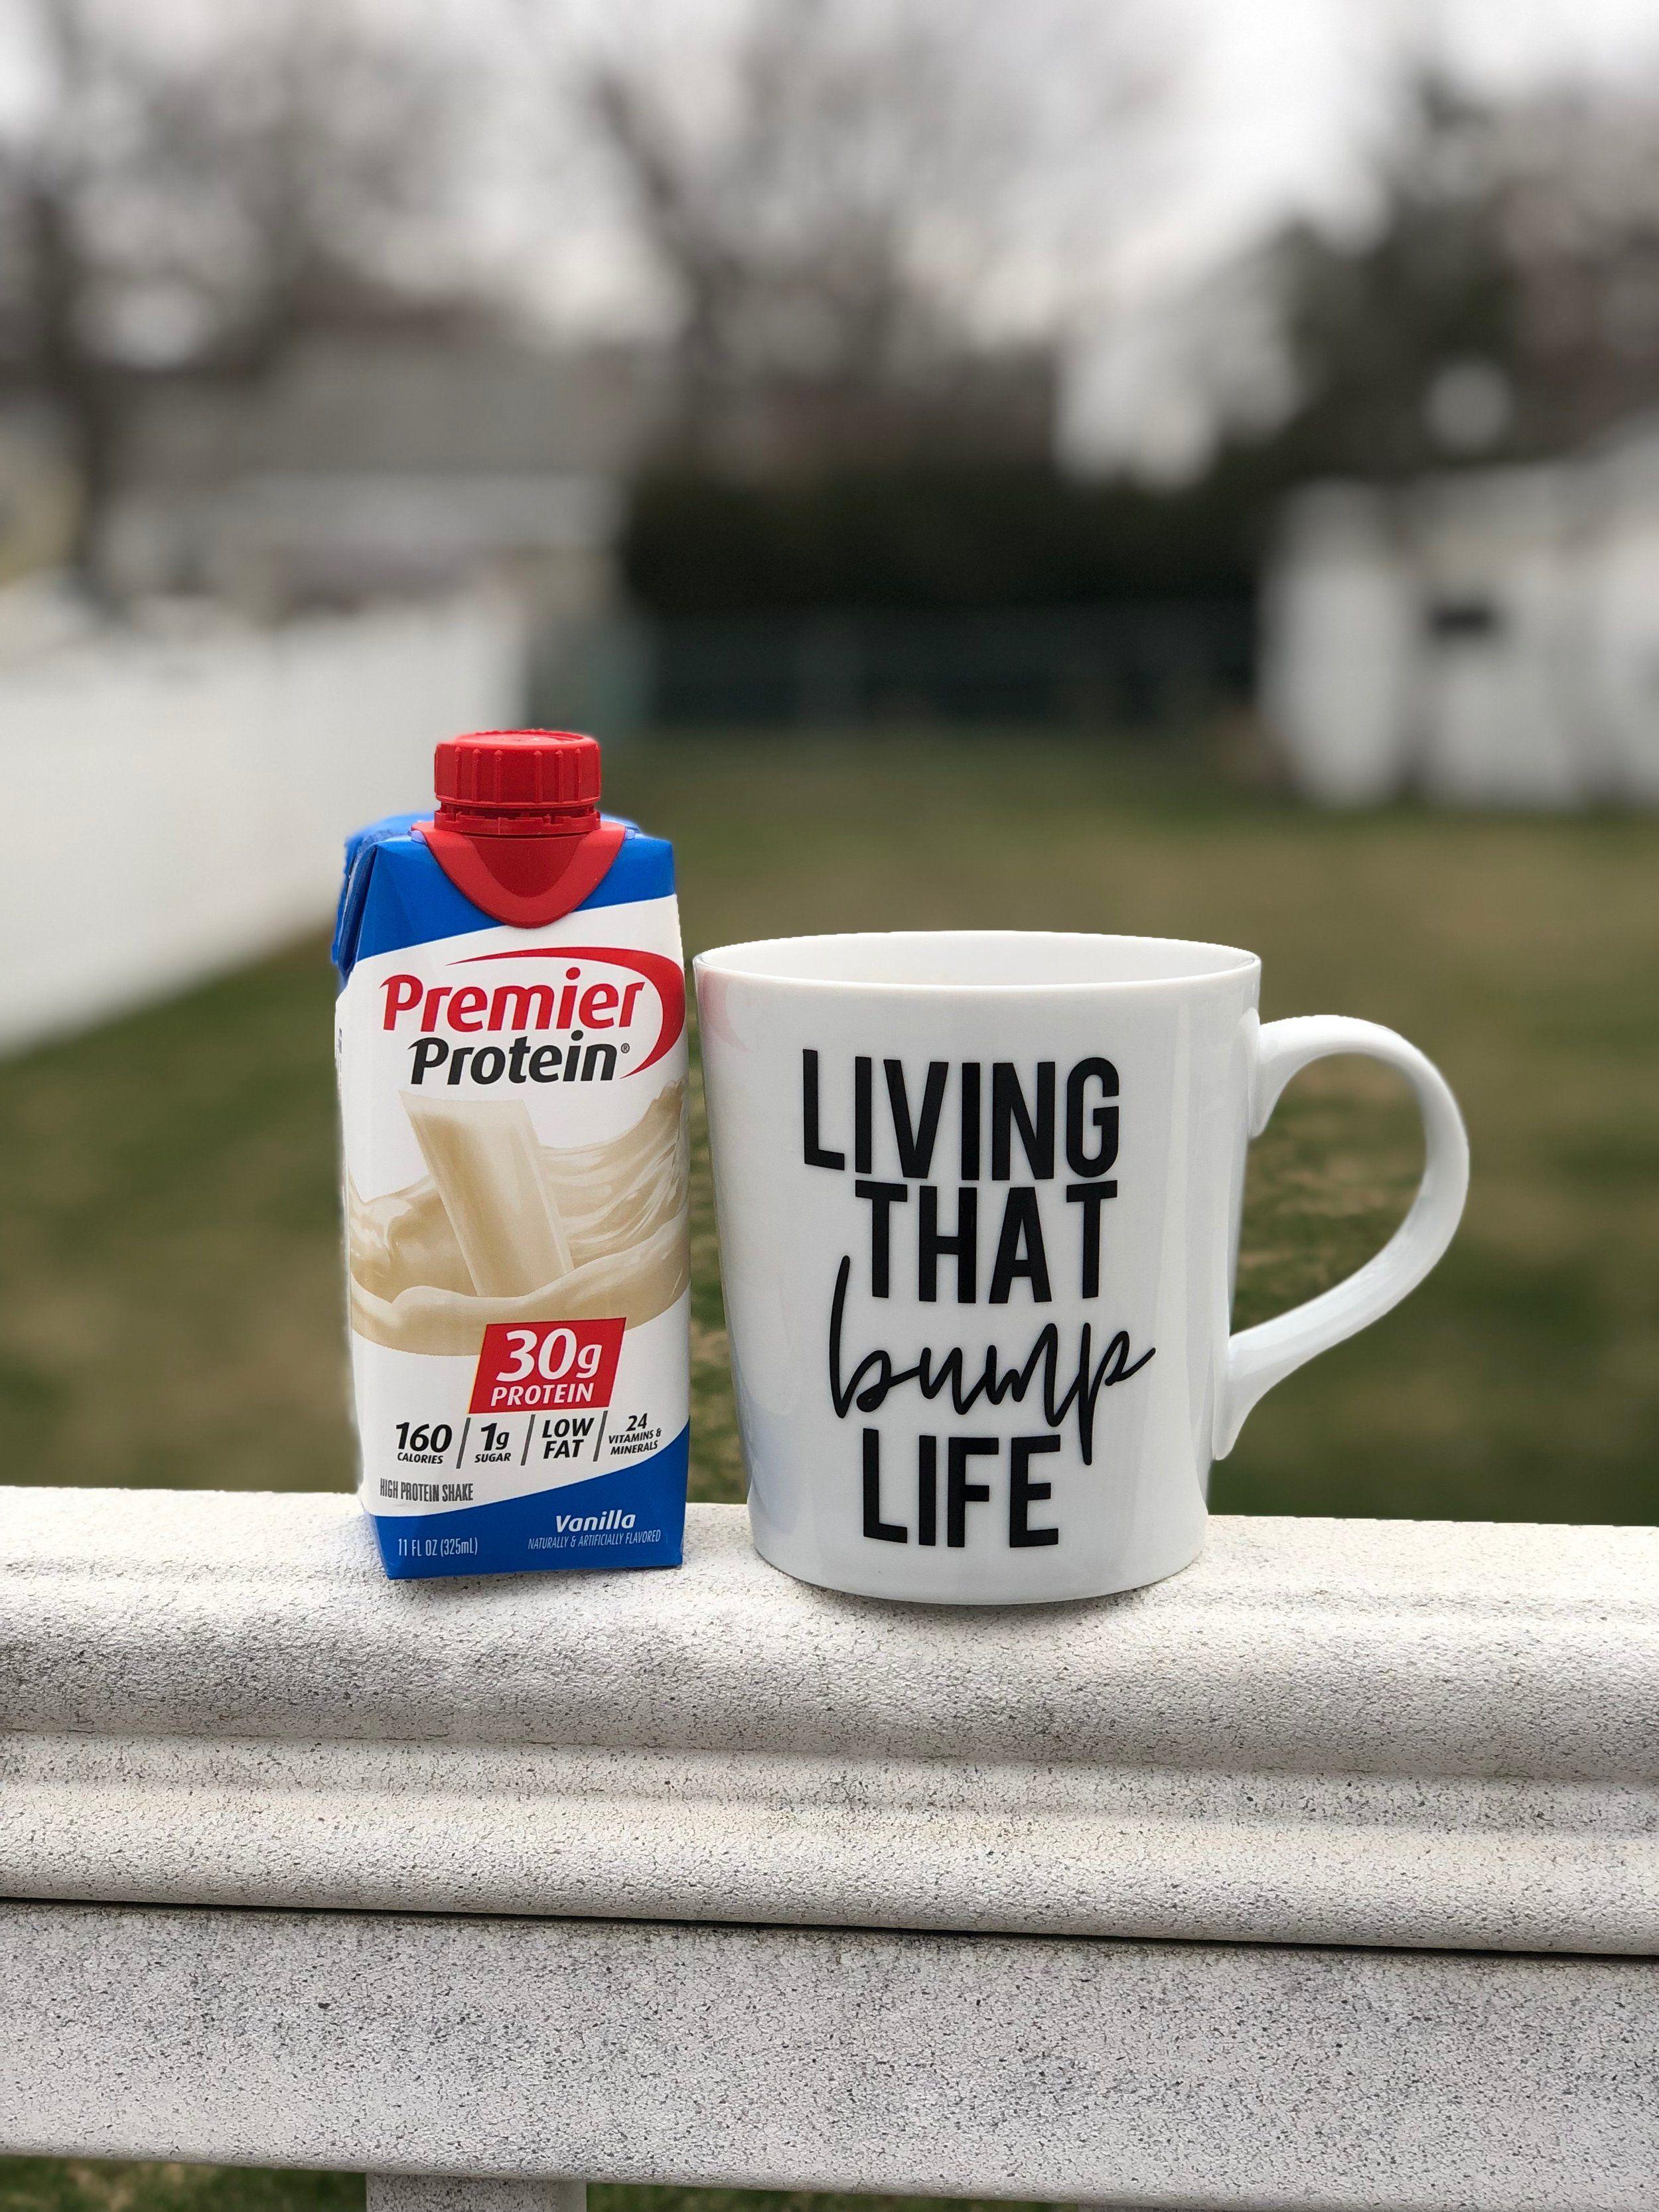 Living That Bump Life Coffee Mug Mugs, Coffee mugs